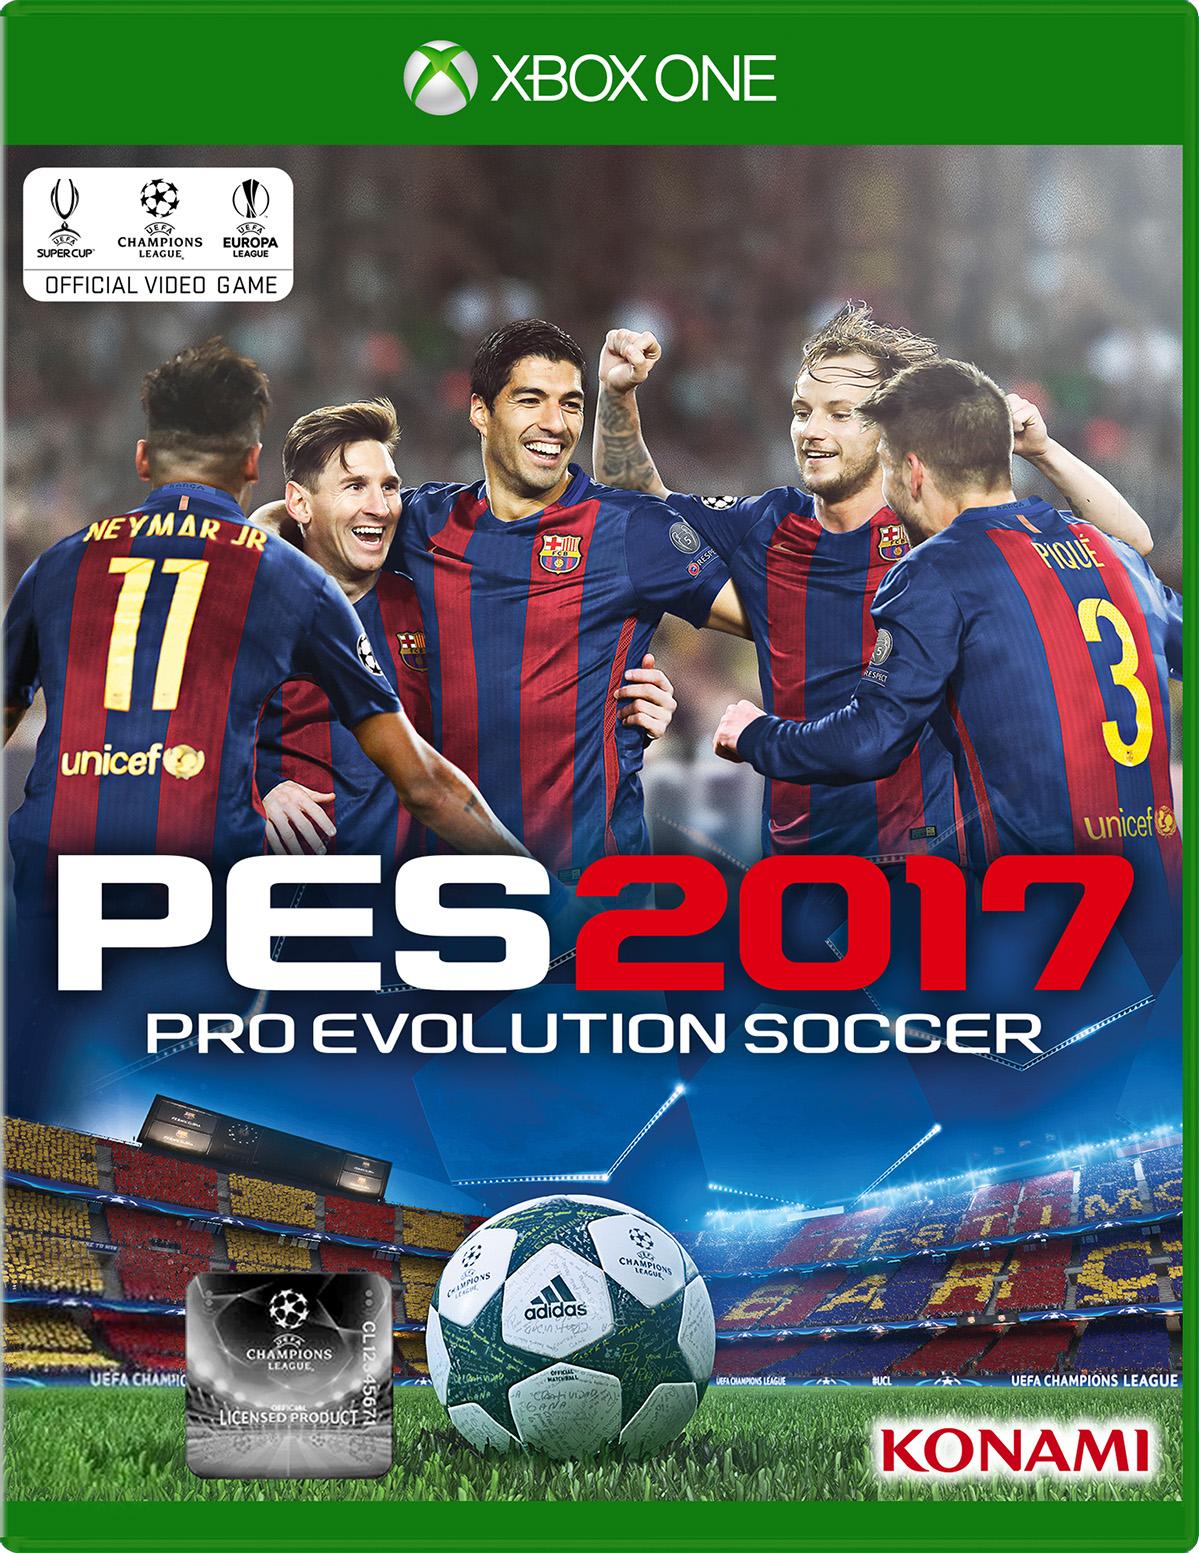 Pro Evolution Soccer 2017 for Xbox One